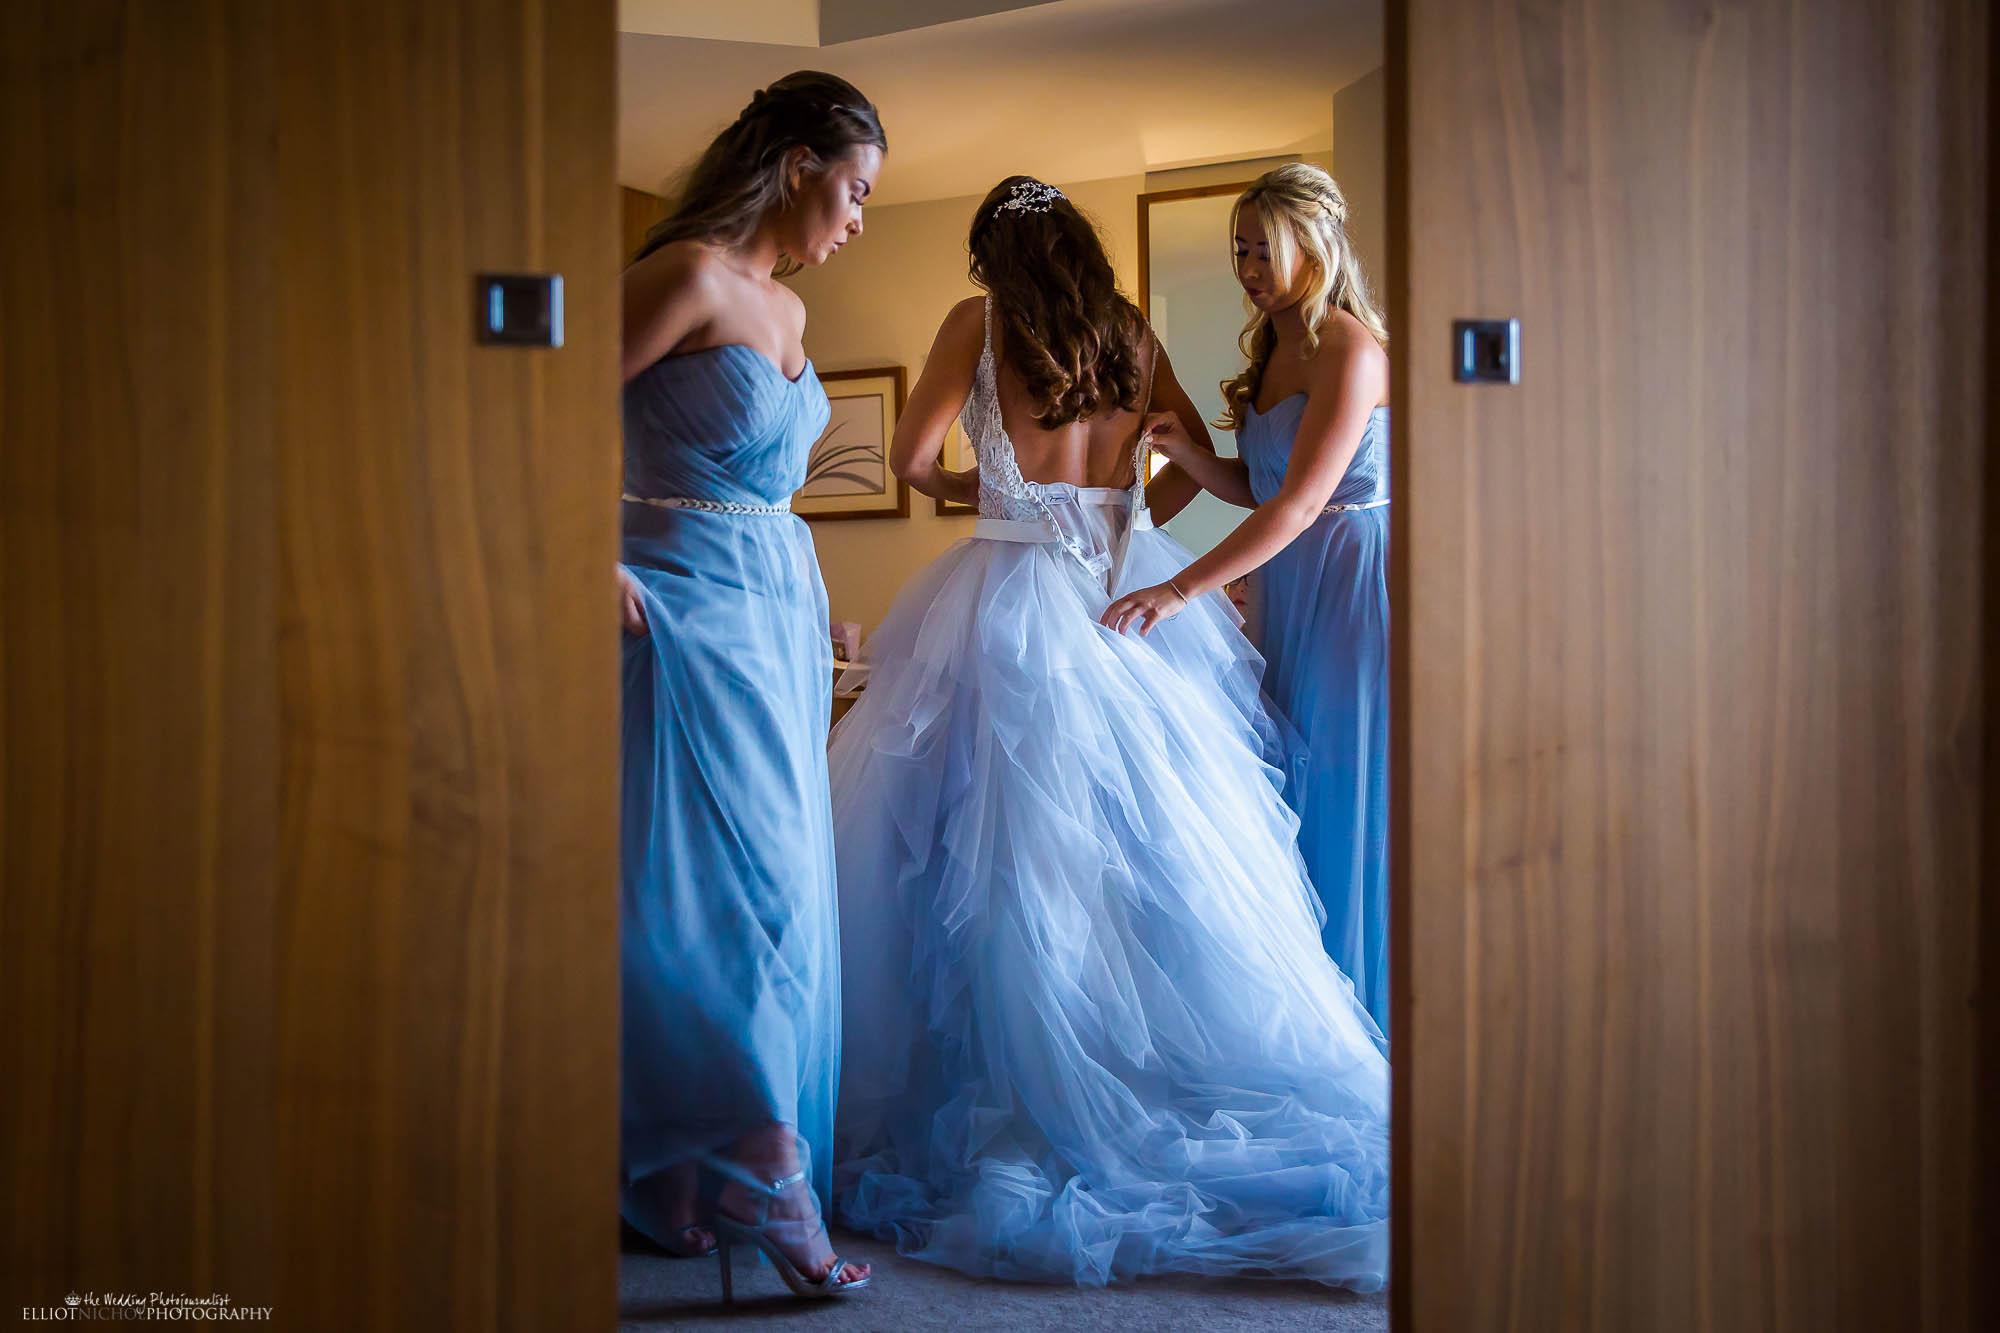 Bride helped into her wedding dress by her bridesmaids. Northeast wedding photographer.